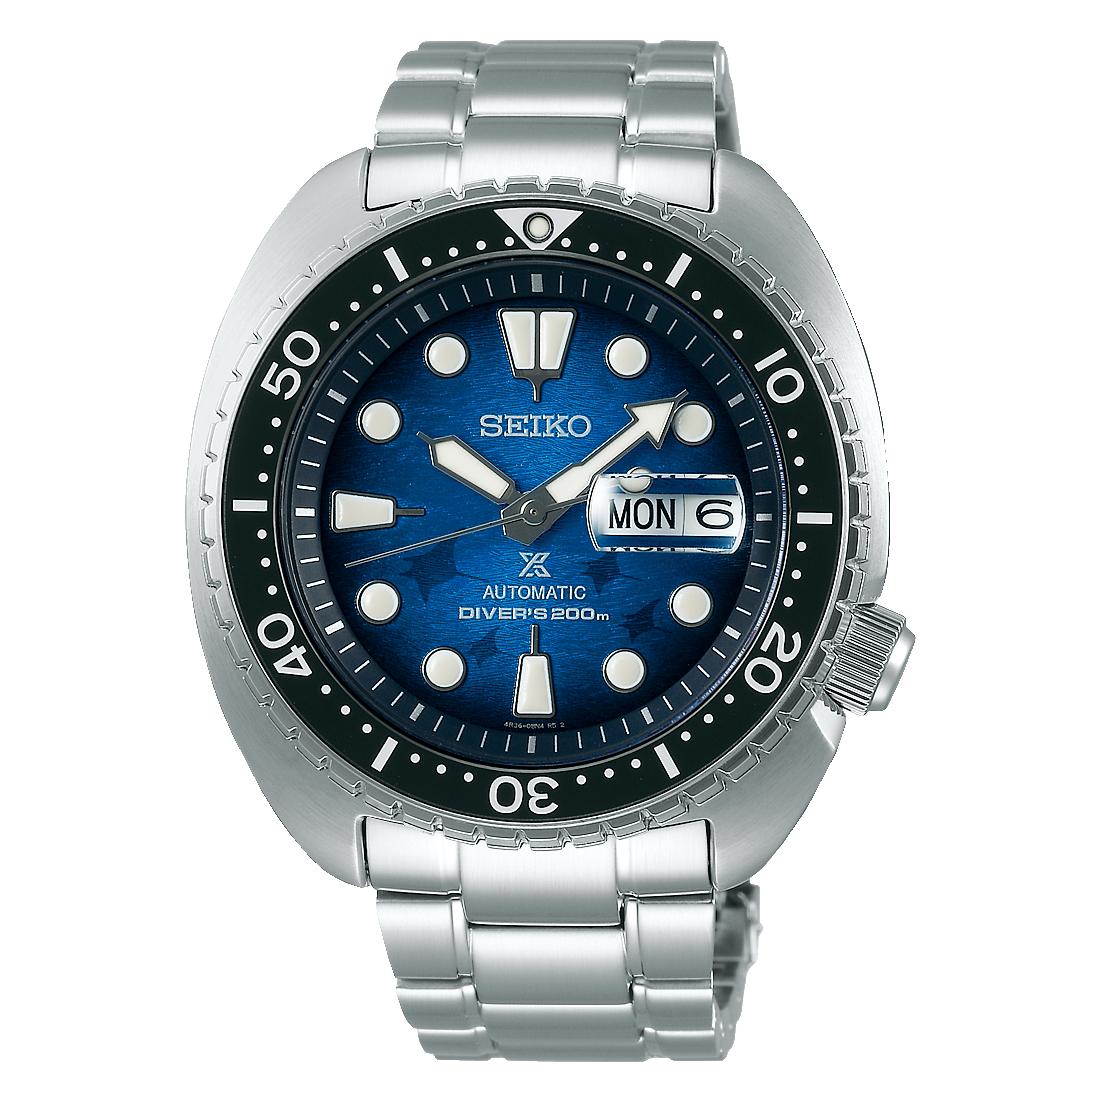 Orologio seiko prospex SRPE39 K1